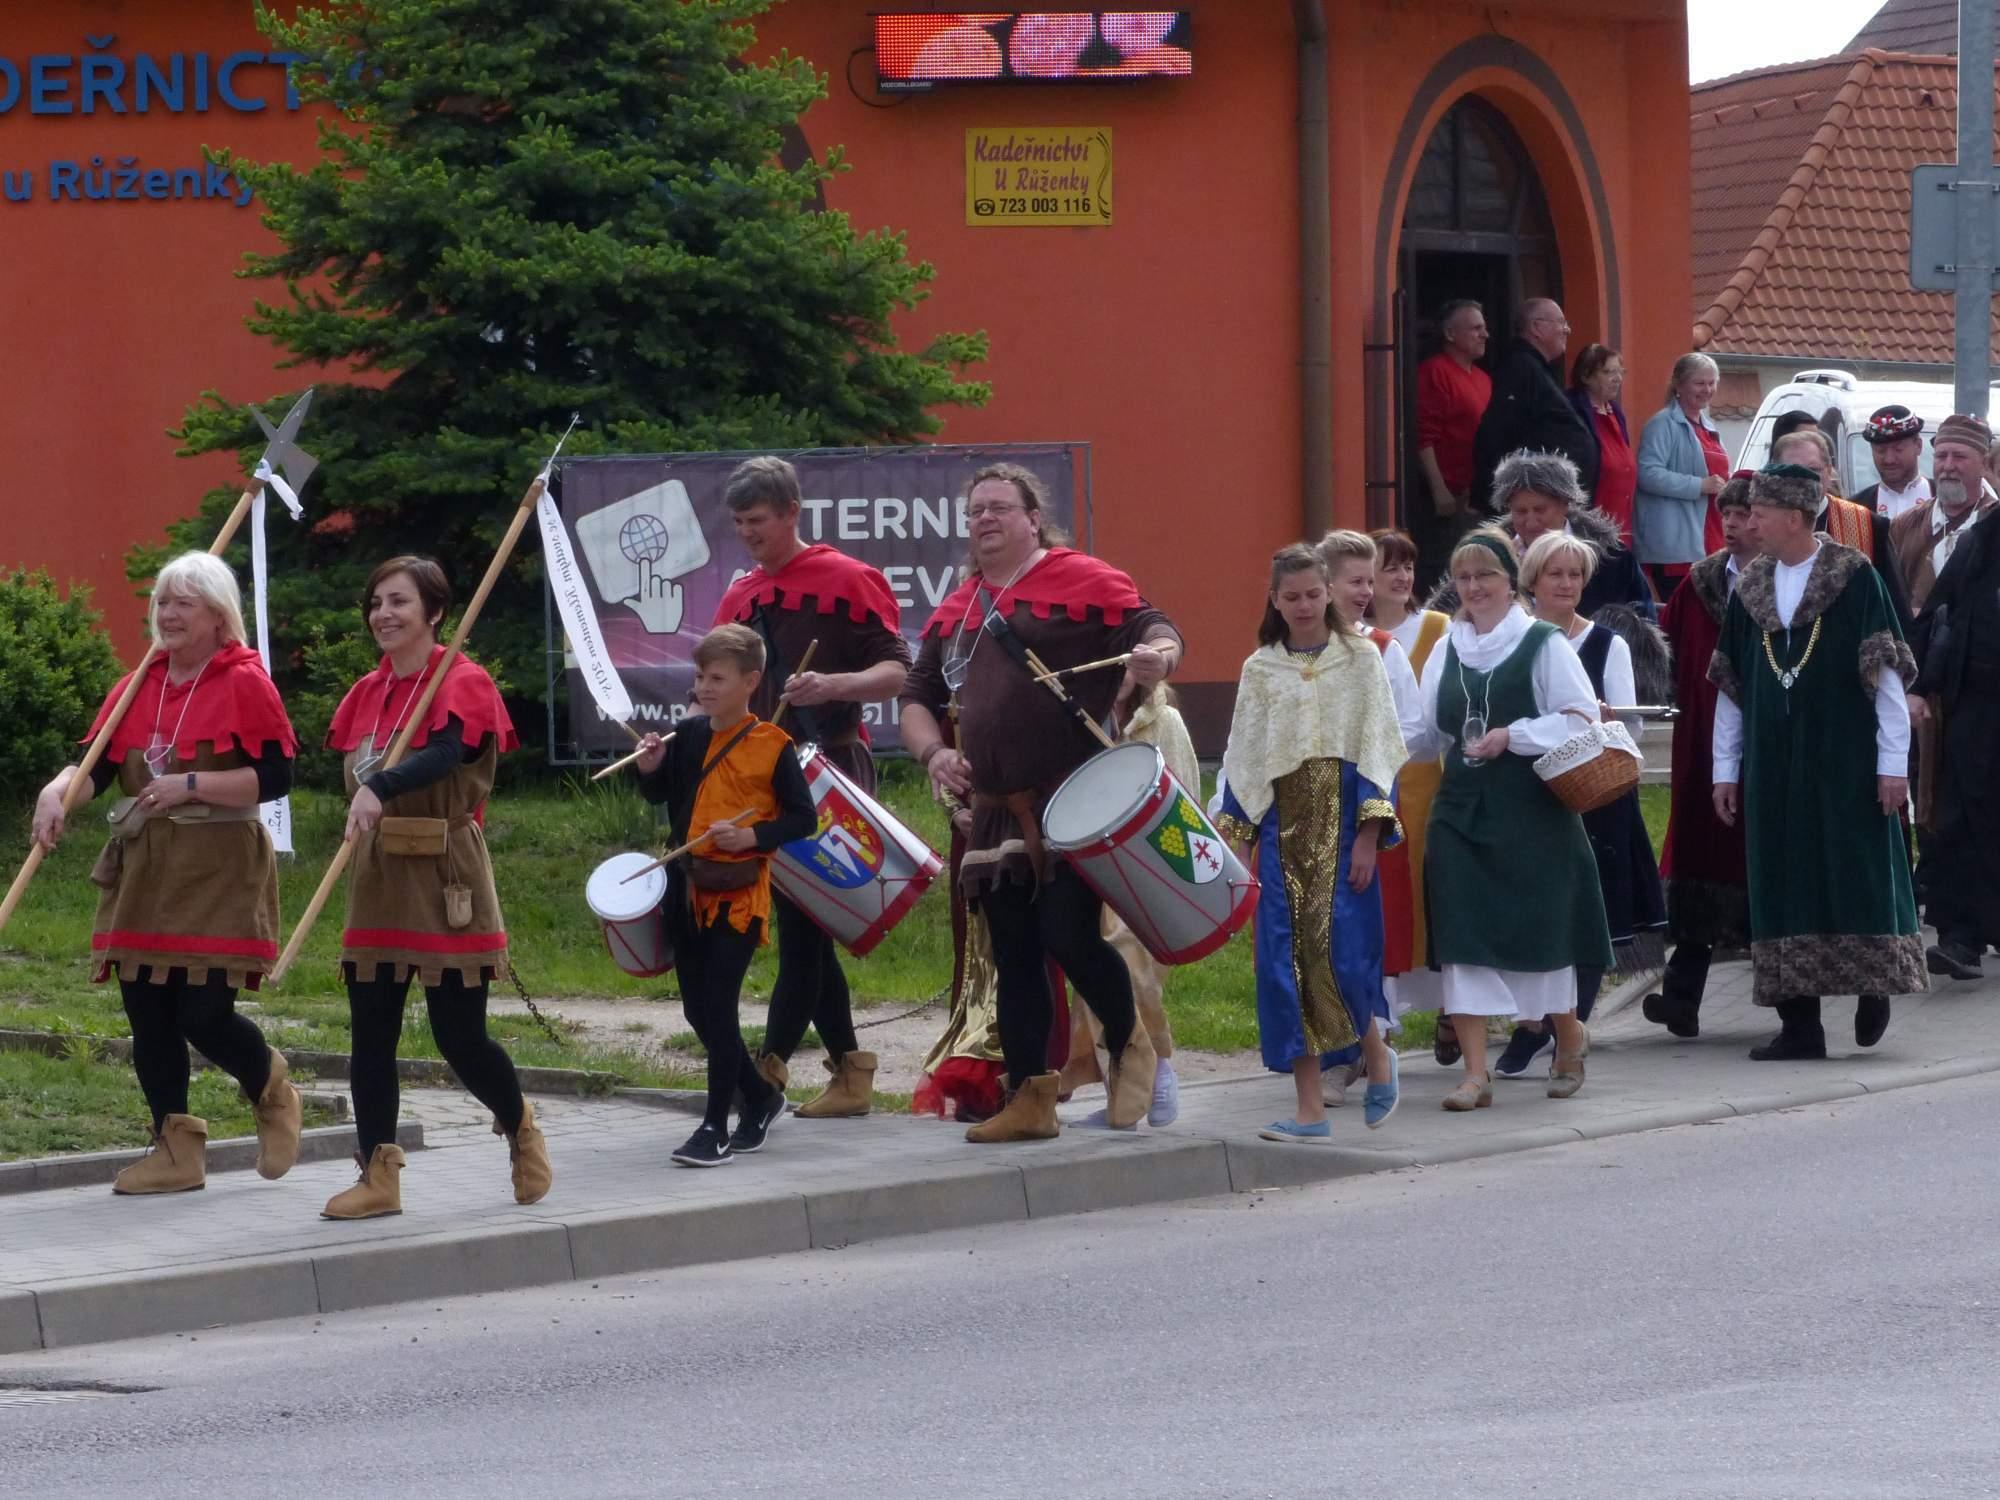 Průvod v historických kostýmech. Foto: Ladislav Zouhar.